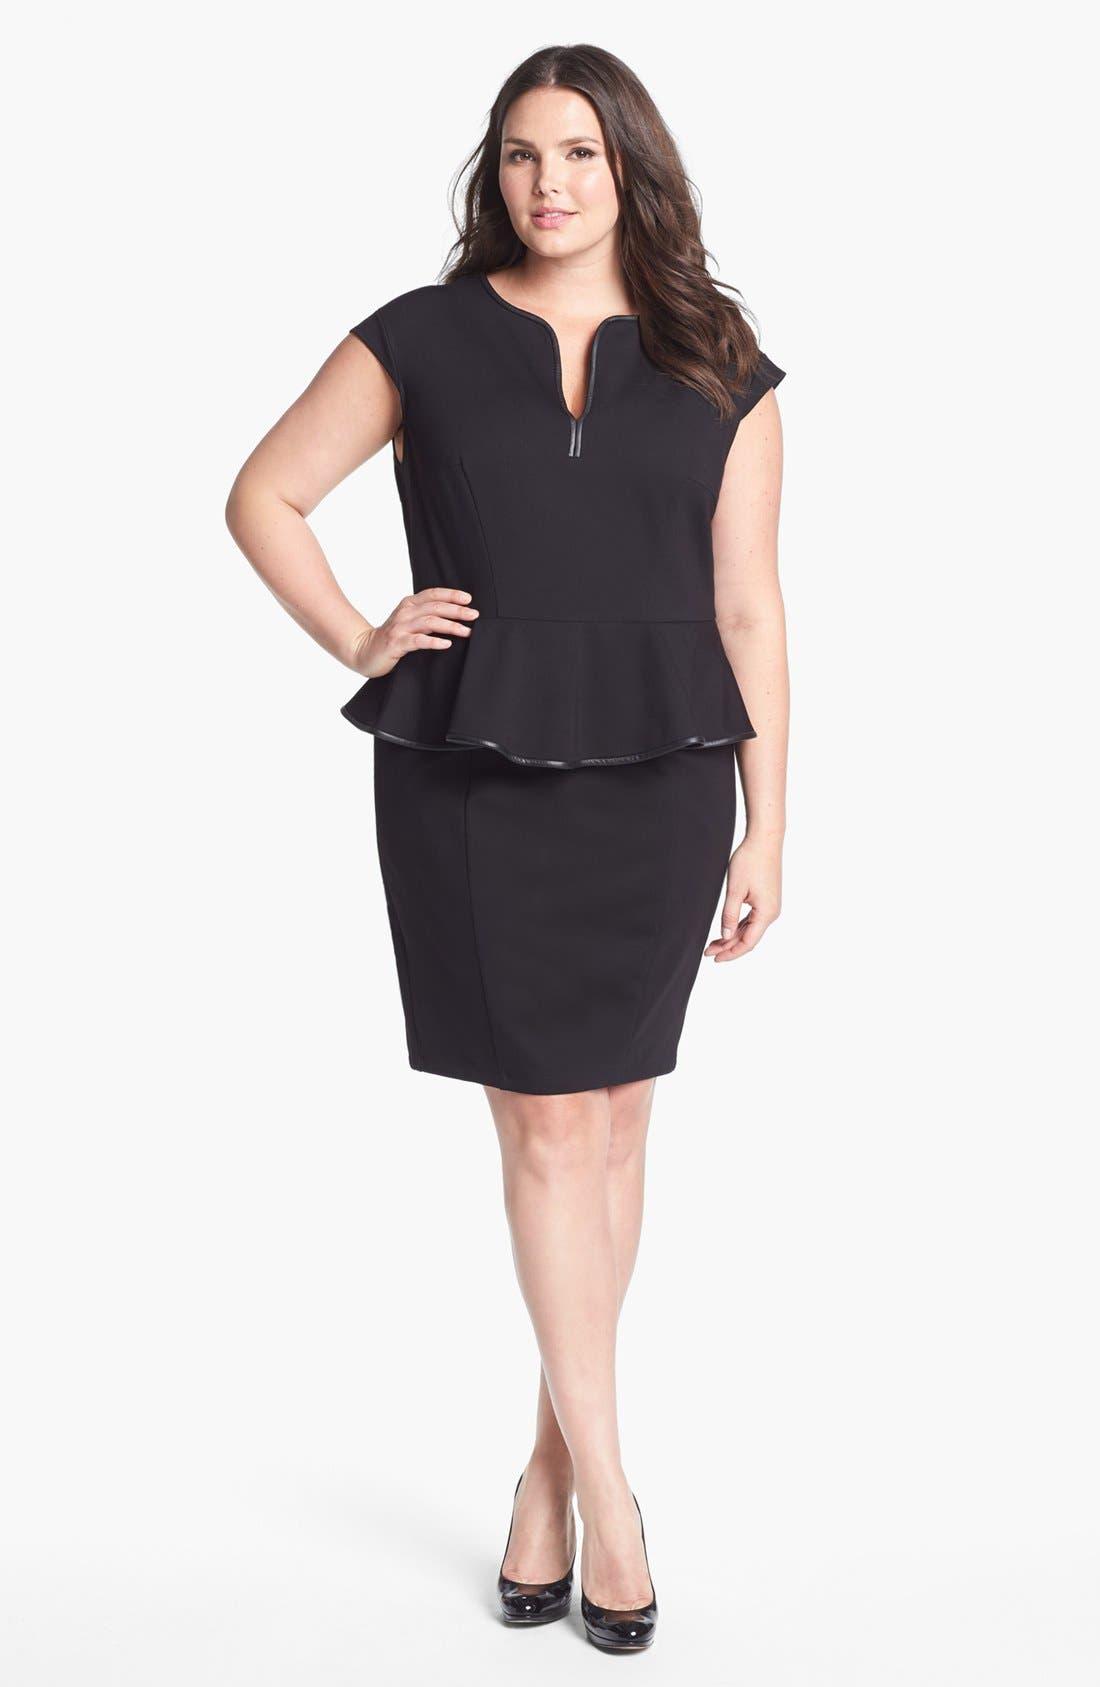 Alternate Image 1 Selected - ABS by Allen Schwartz Leather Trim Peplum Dress (Plus Size)